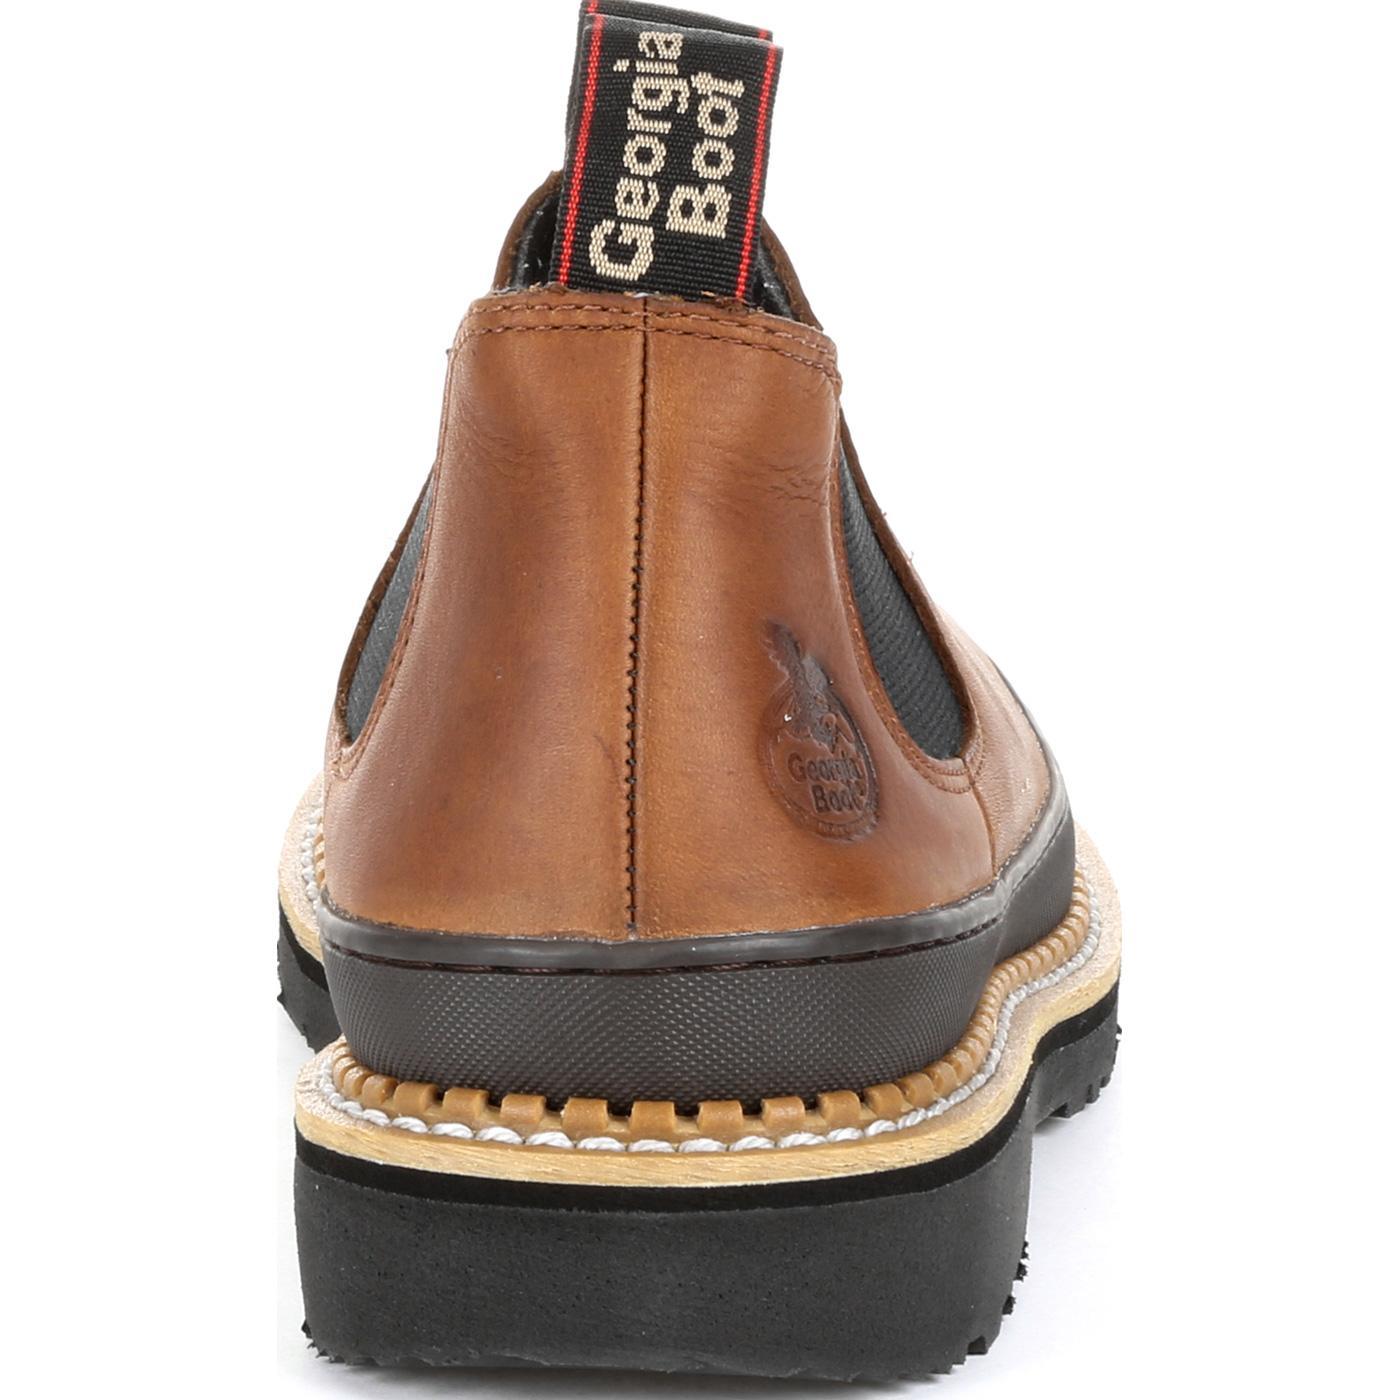 8e00dbaed03 Georgia Giant Revamp Steel Toe Romeo Work Shoe